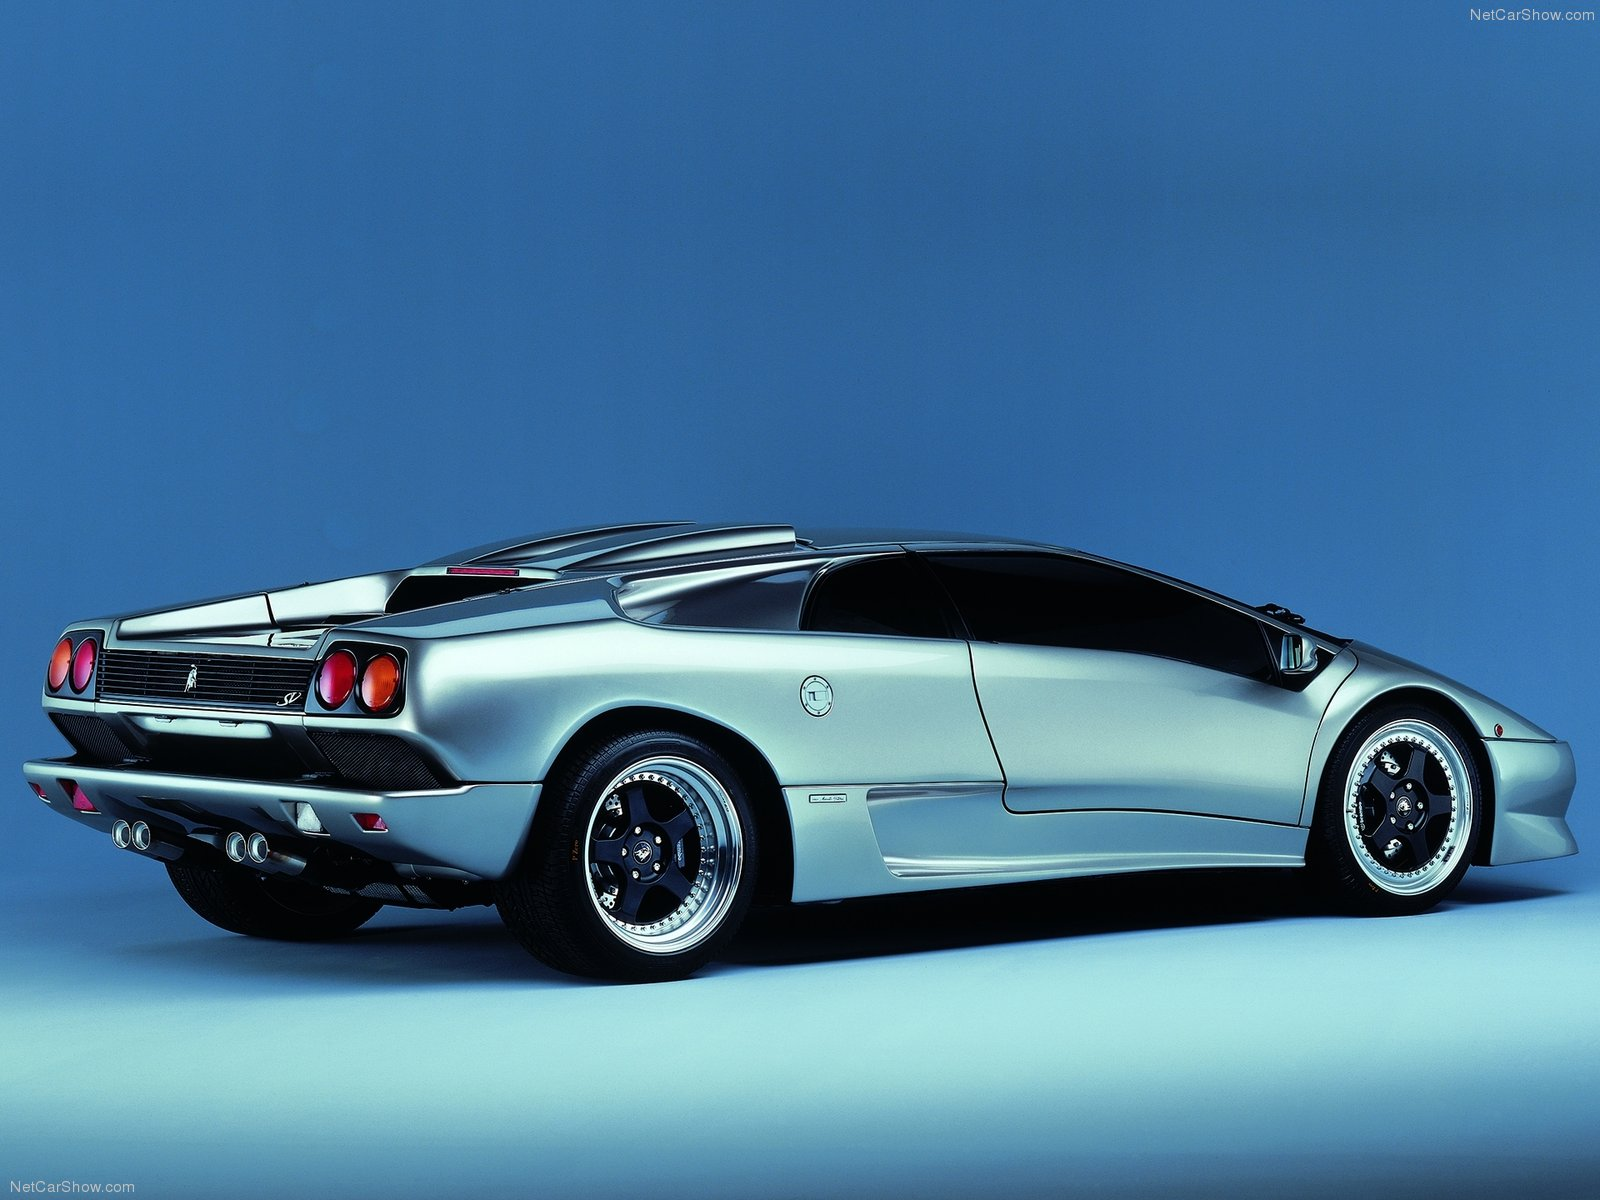 3DTuning of Lamborghini Diablo Coupe 1997 3DTuning.com - unique on